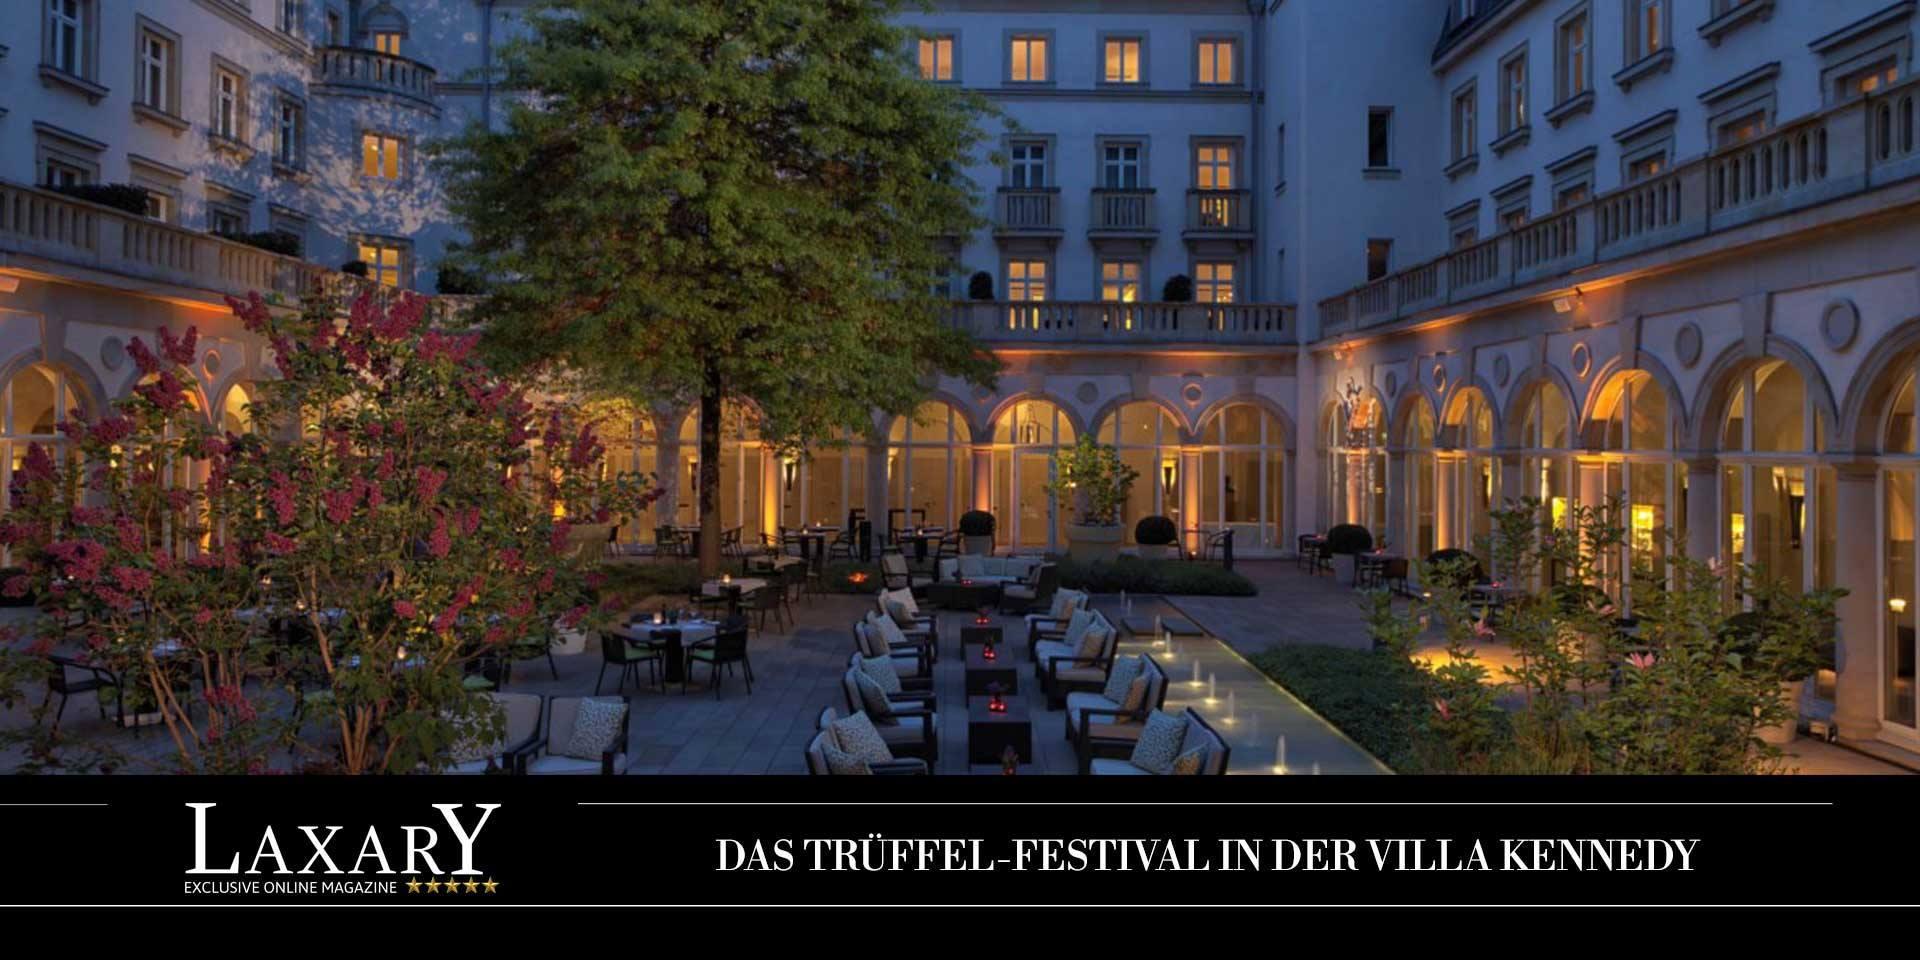 Das Trüffel-Festival in der Villa Kennedy Frankfurt am Main